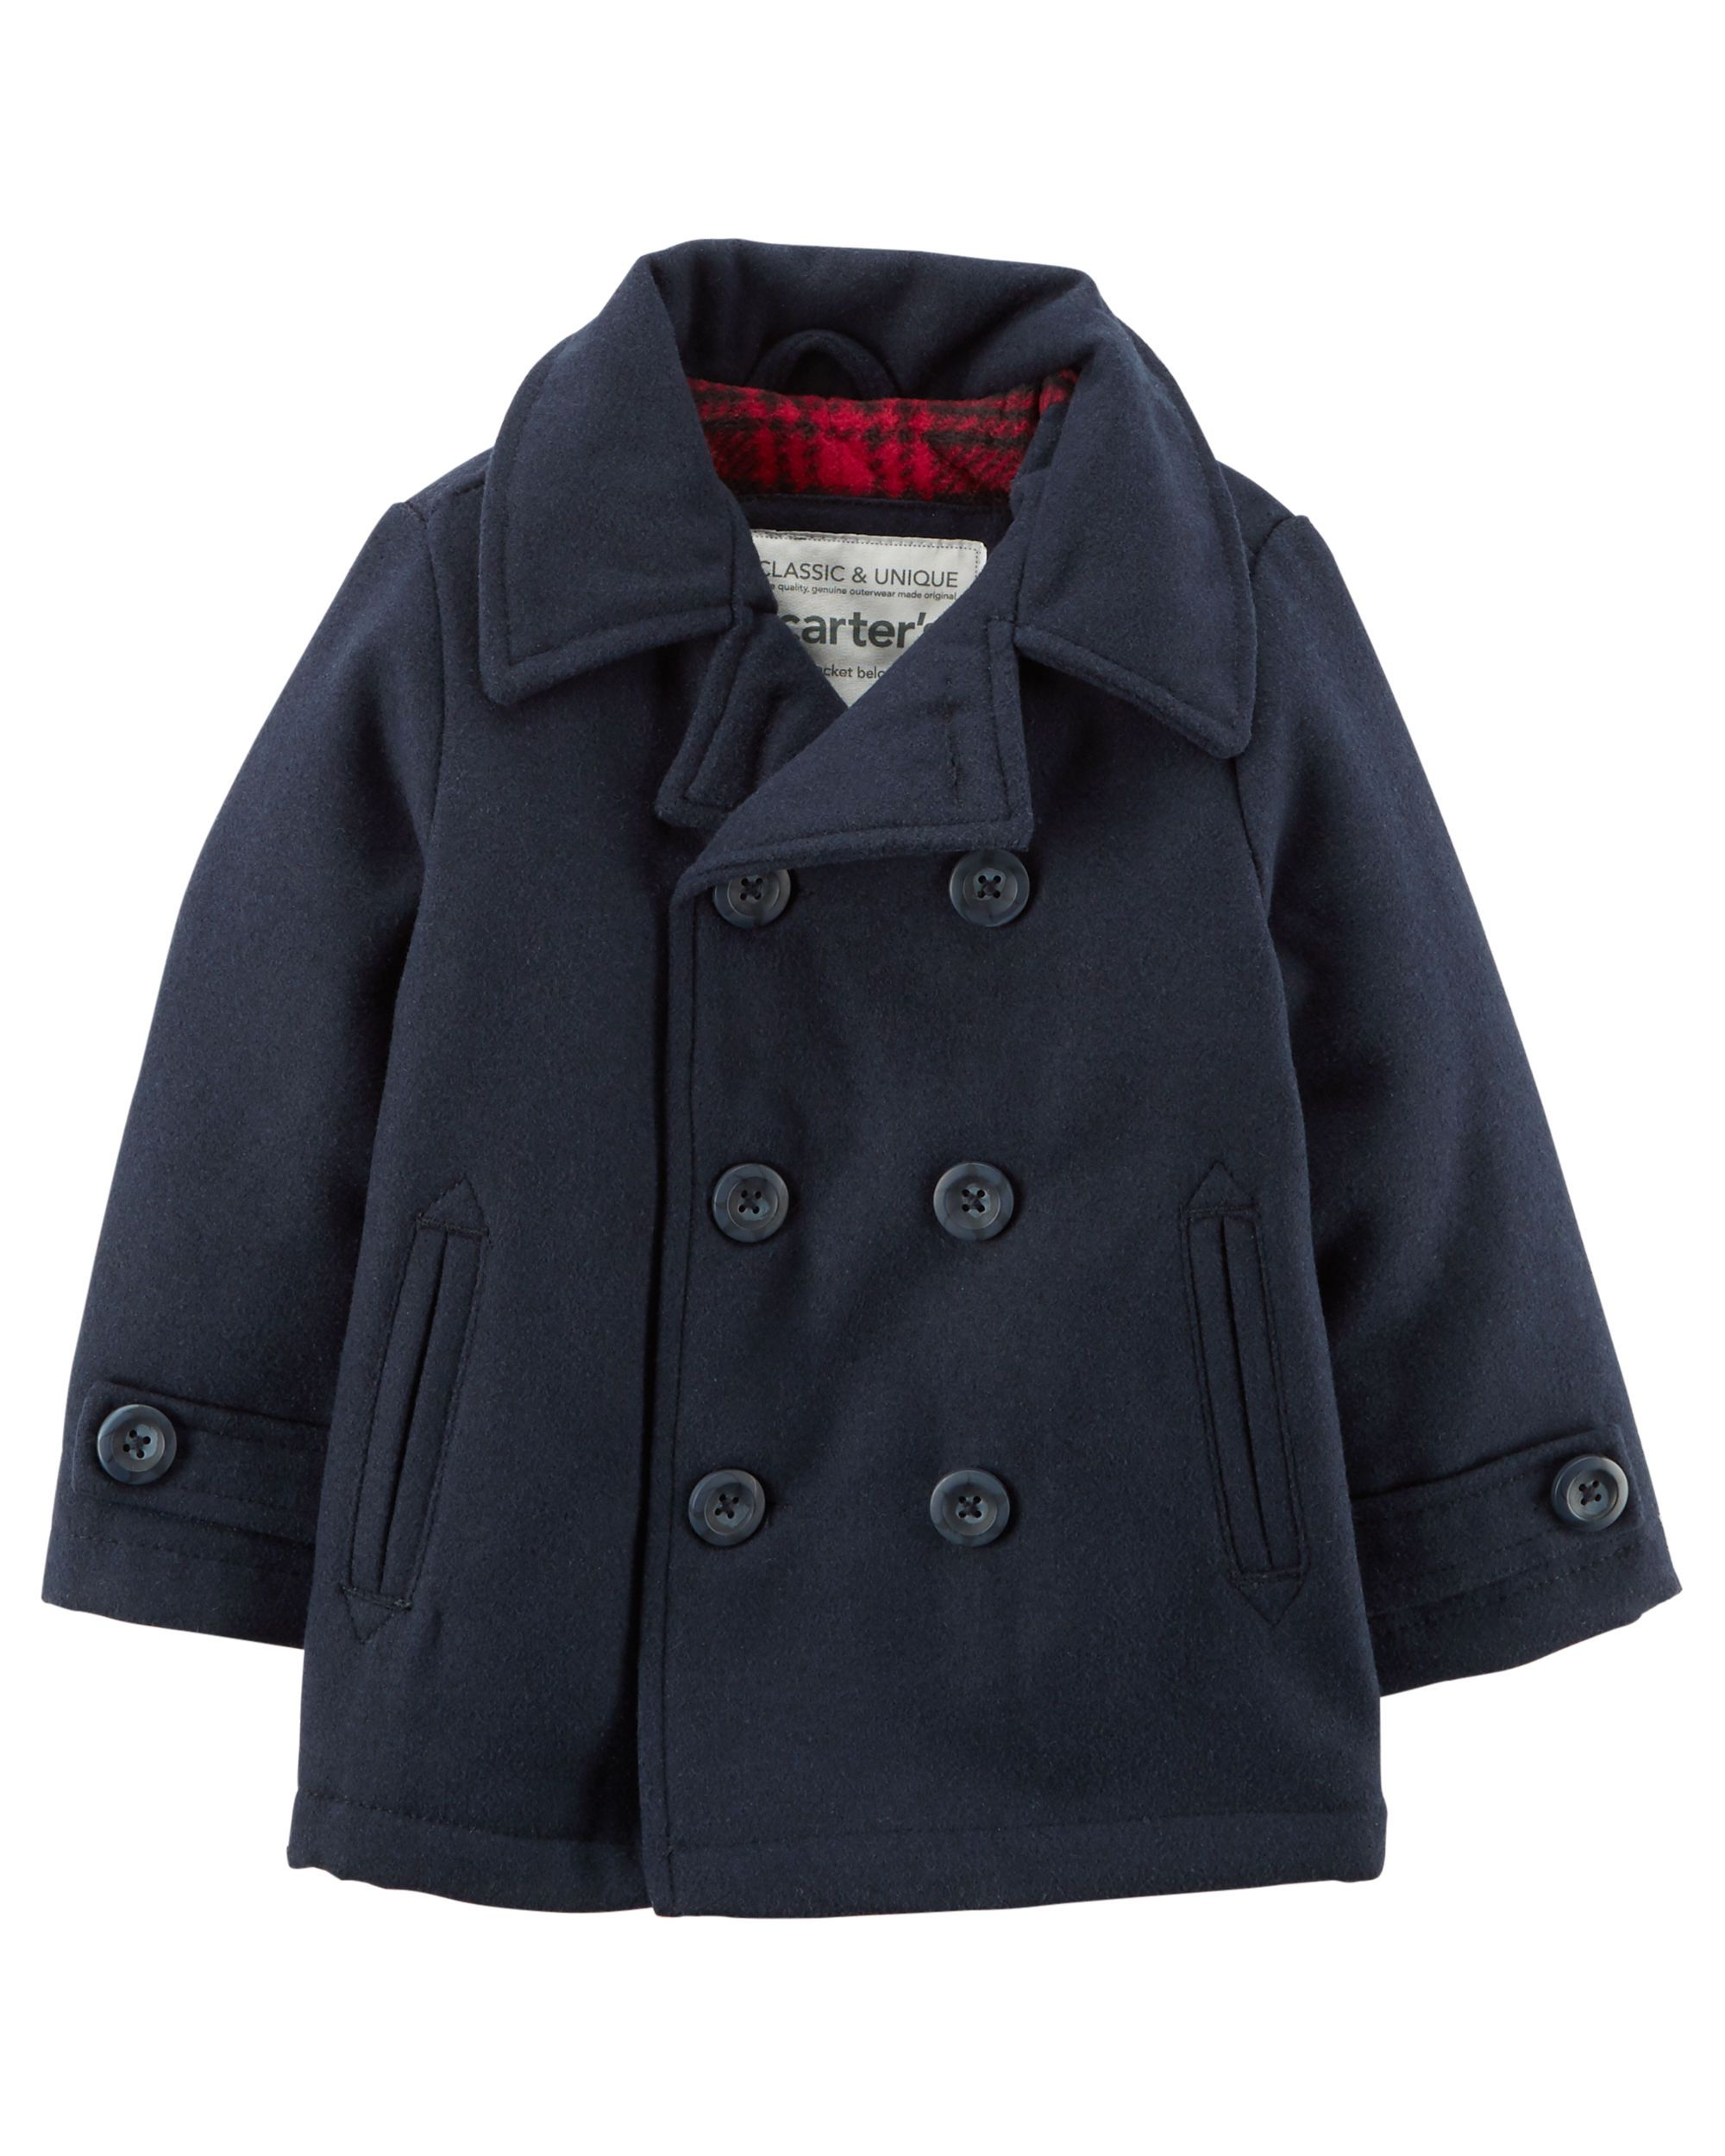 Wool Like Peacoat Cool Boys Clothes Baby Boy Jackets Baby Boy Coat [ 2500 x 2000 Pixel ]